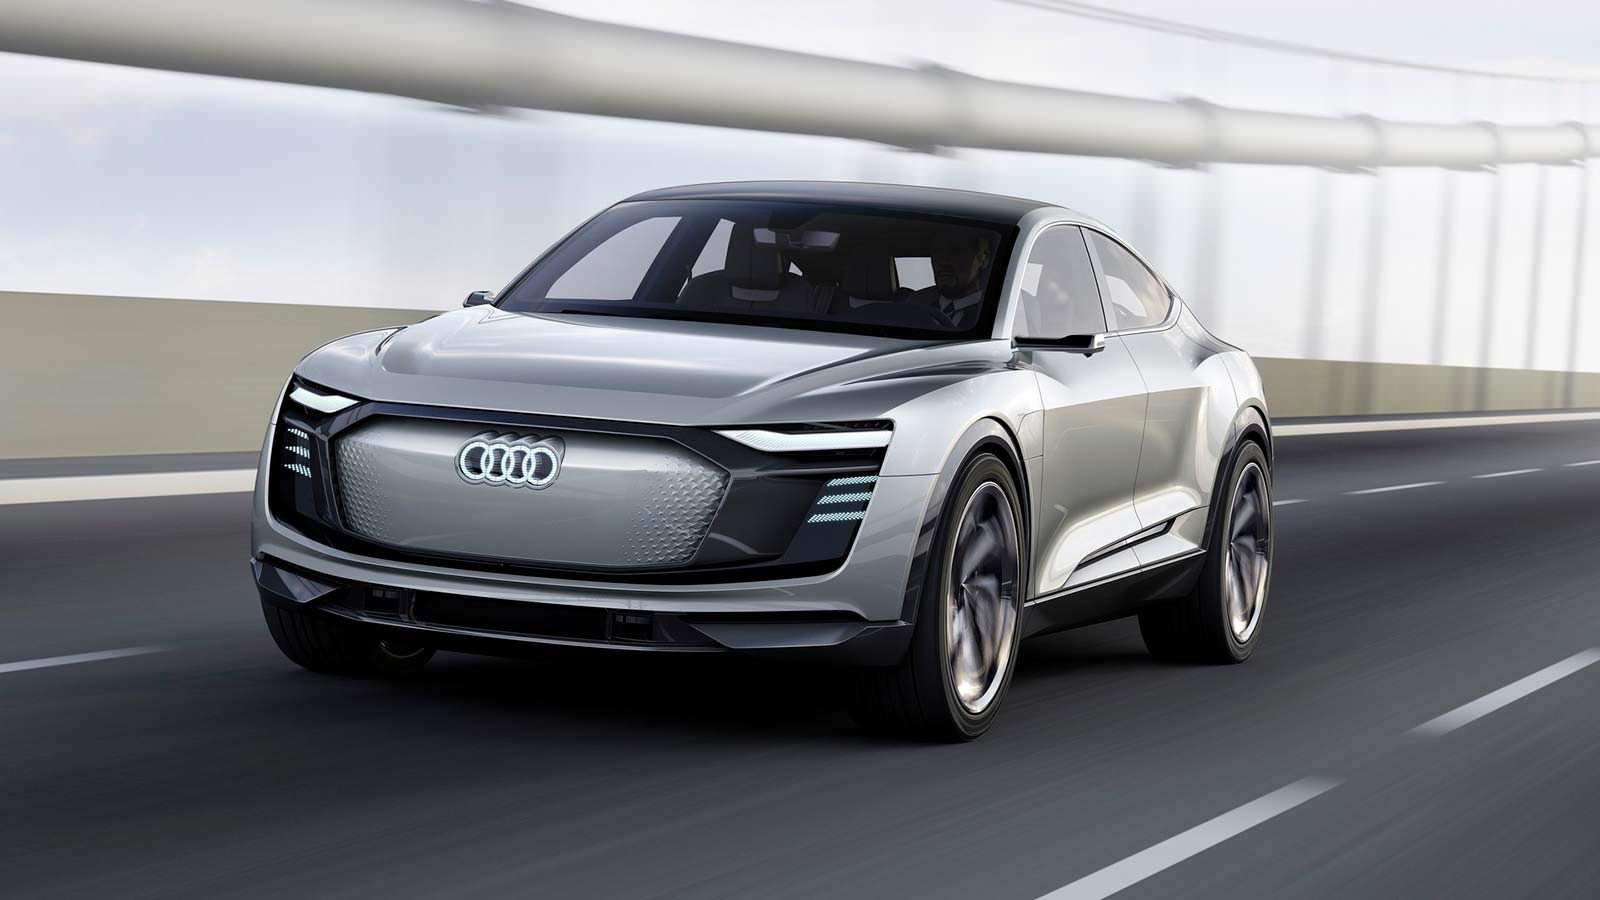 Купе-кроссовер Audi E-Tron Sportback Concept 2017 года